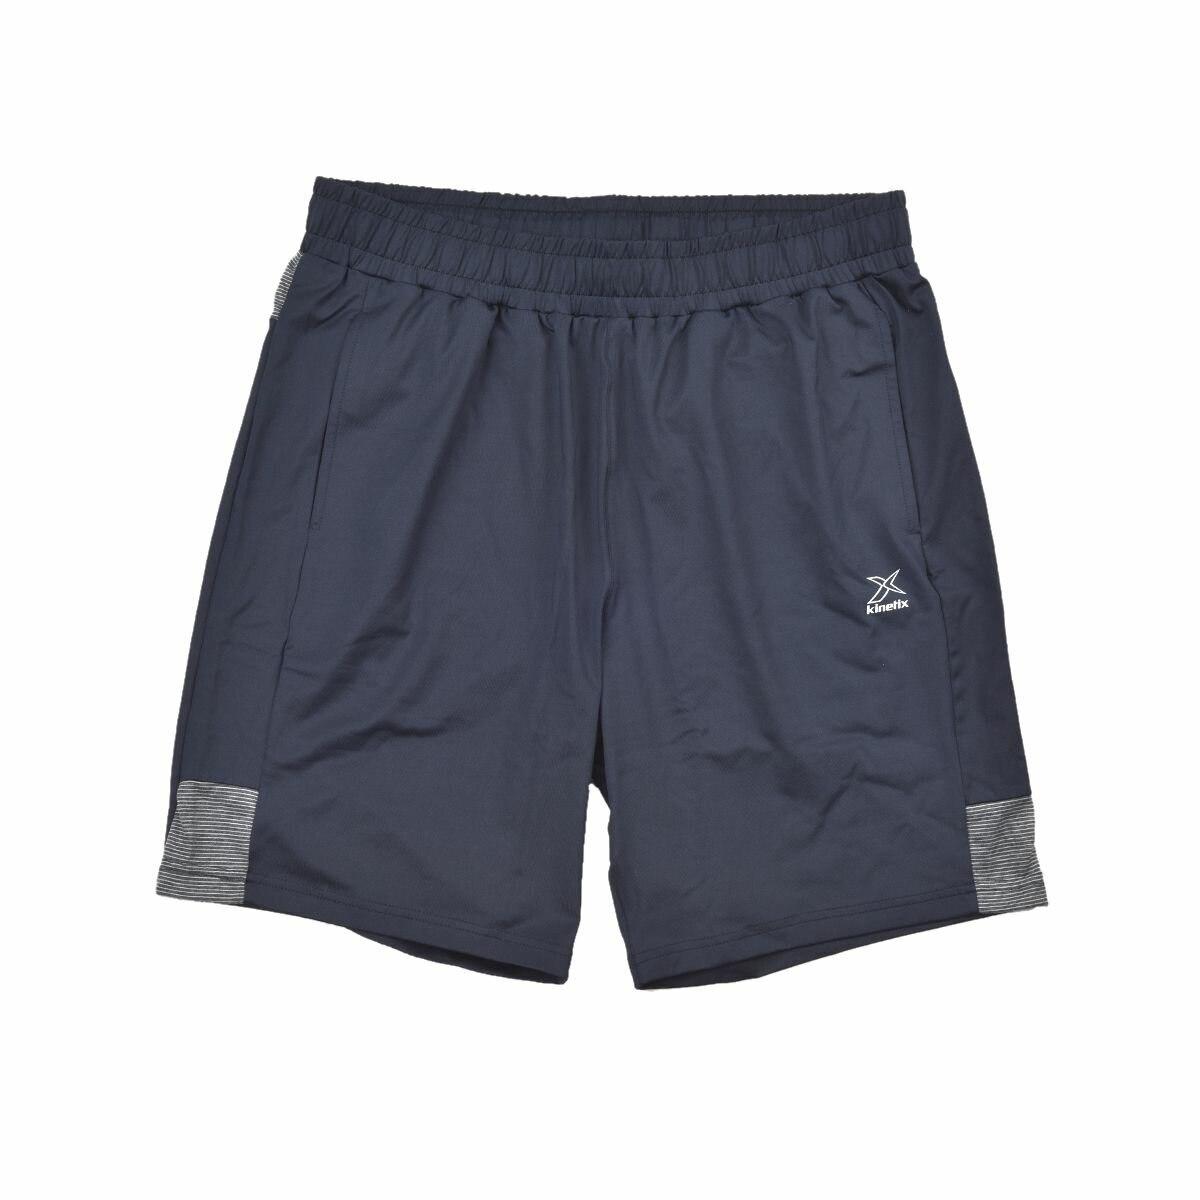 FLO Men's Summer Shorts Navy Blue Men 'S Shorts KINETIX FREDY SORT